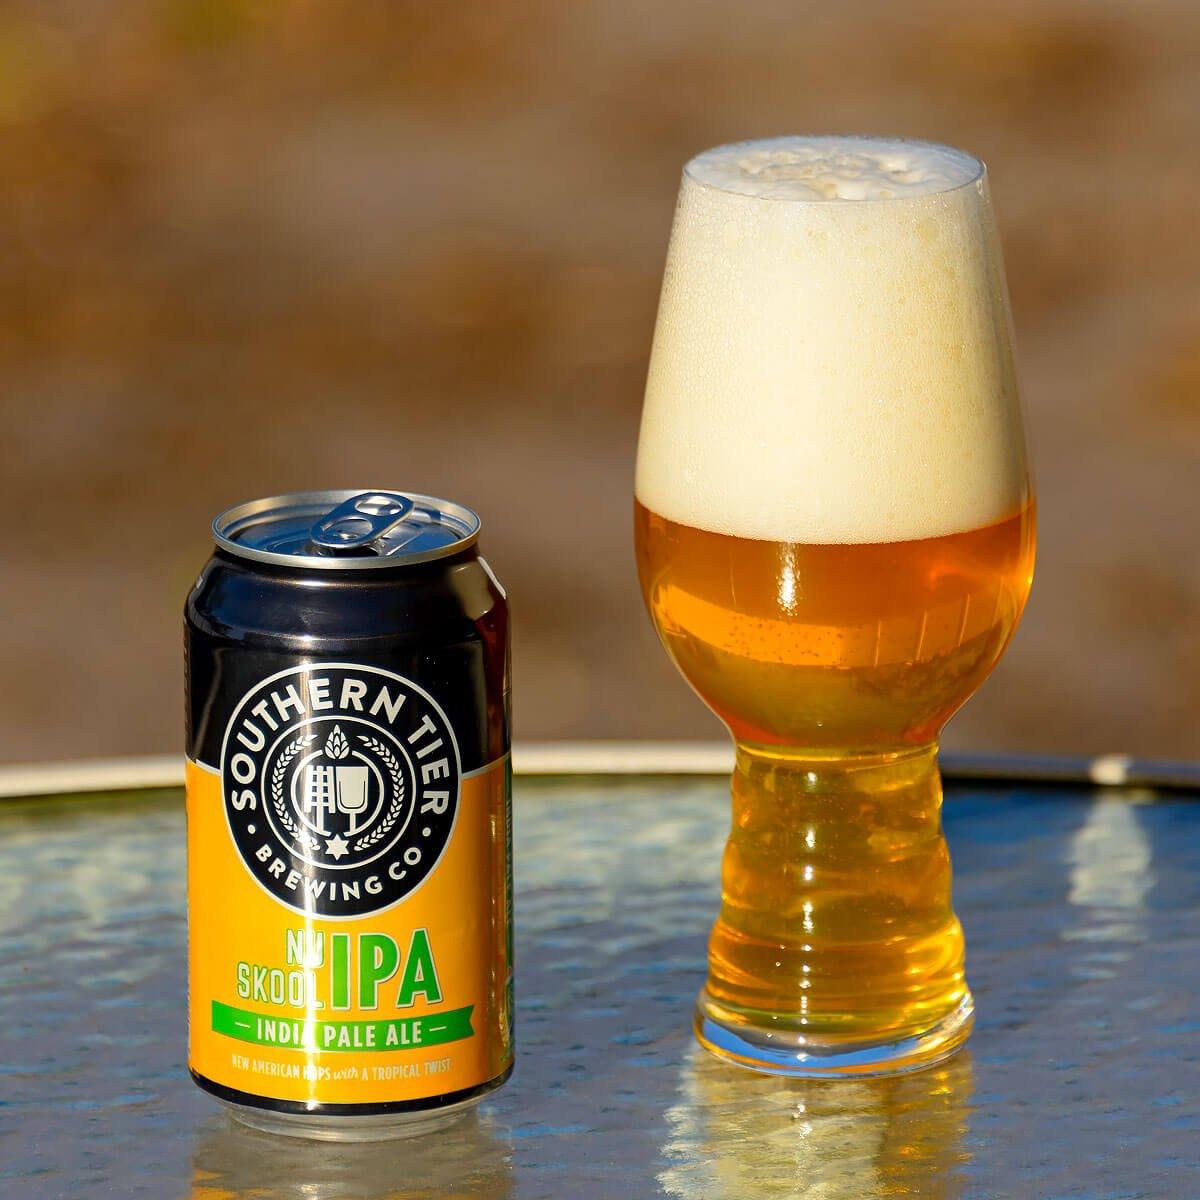 Nu Skool IPA, an American IPA by Southern Tier Brewing Co.